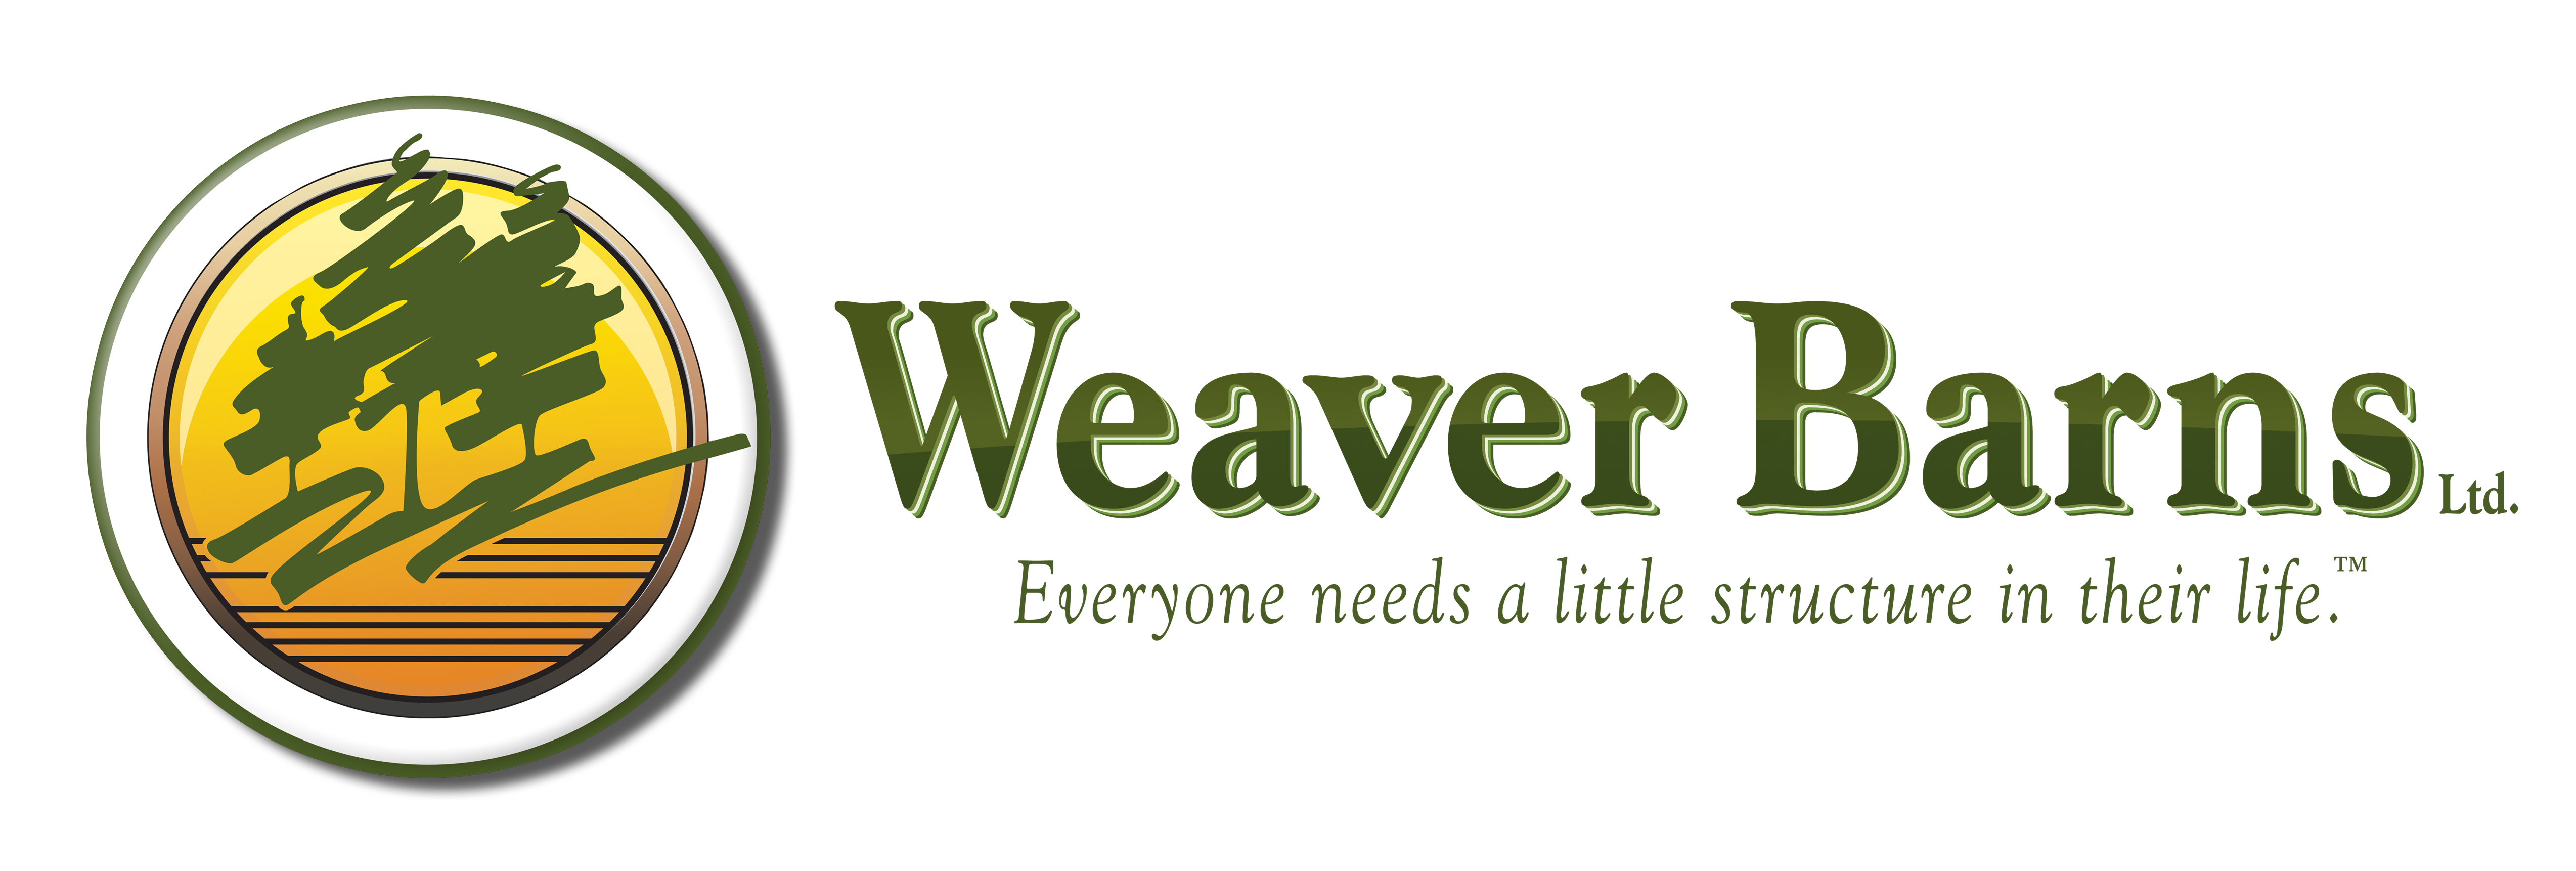 WeaverBarns Logo